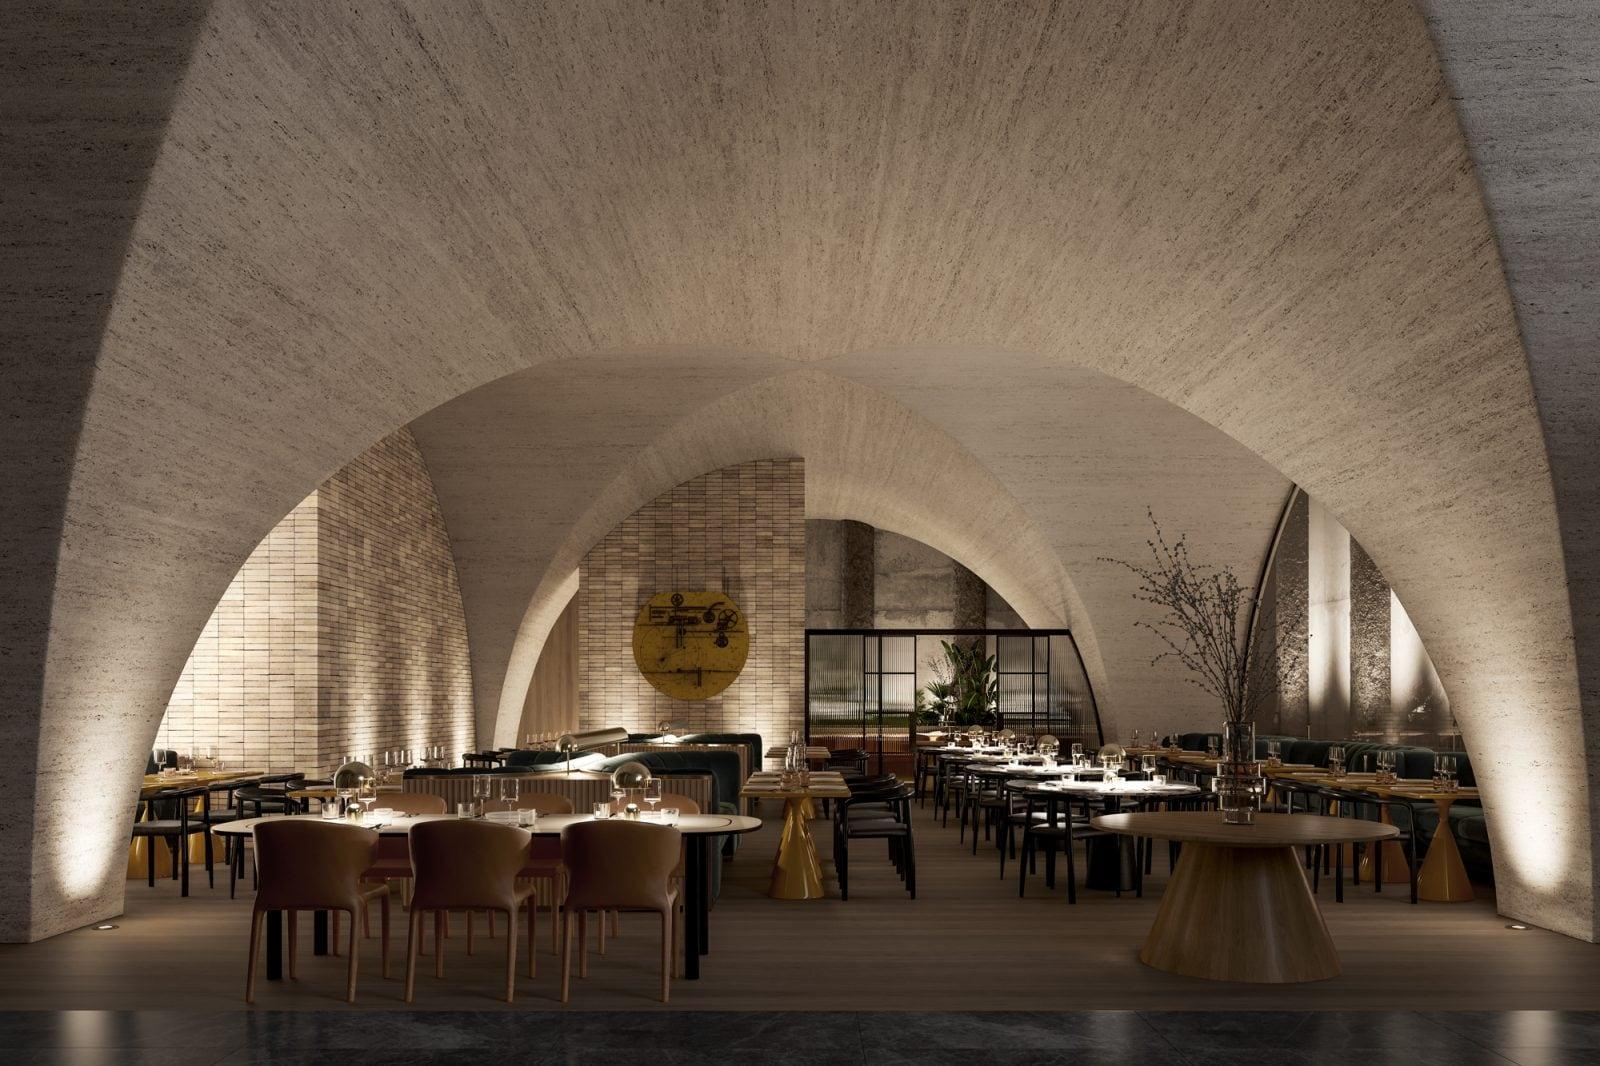 Artist's impression – Restaurant Concept